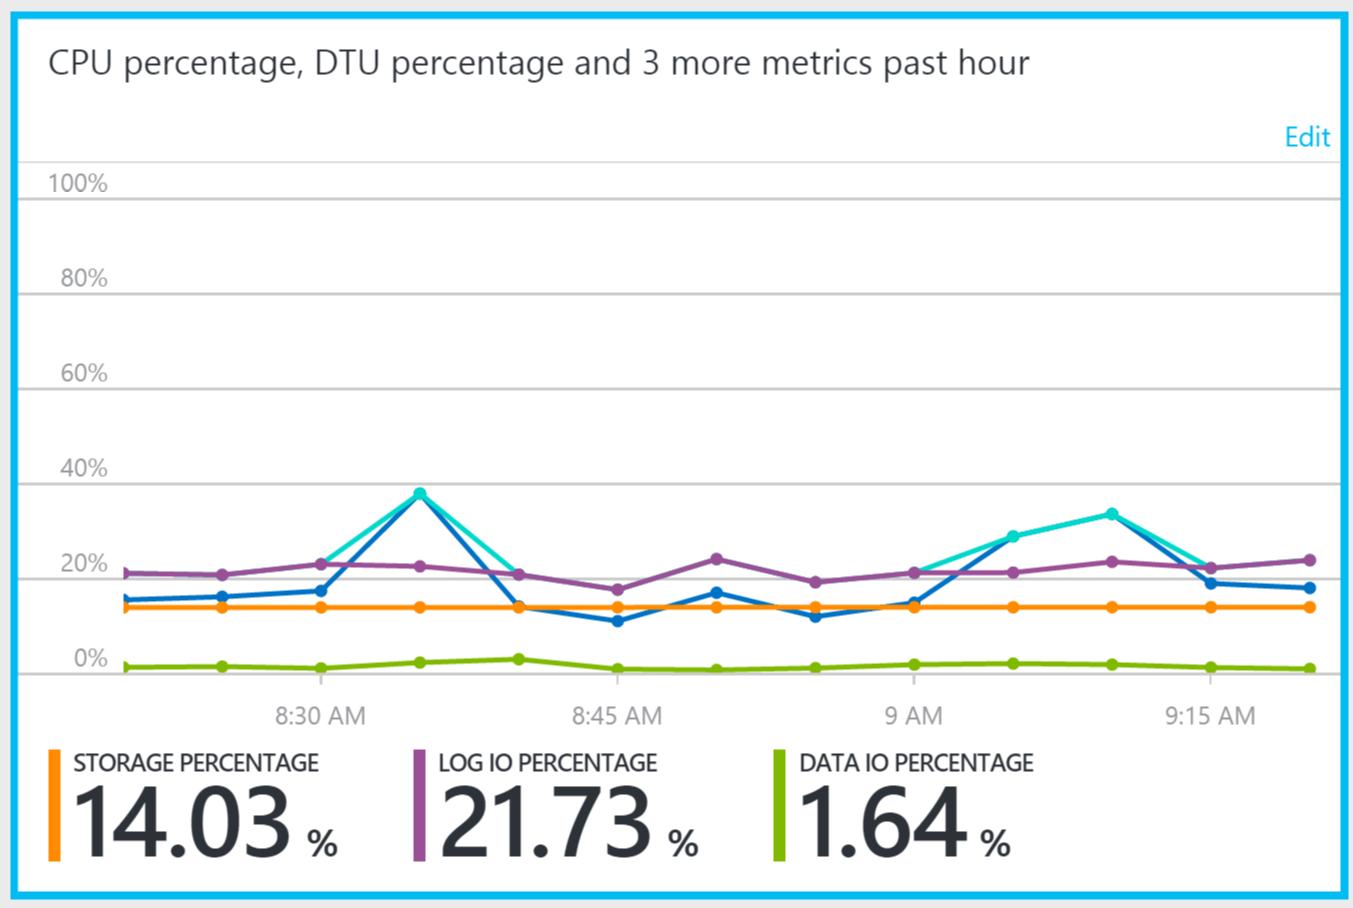 CPU Percentage DTU percentage SQL Azure Elastic Pool